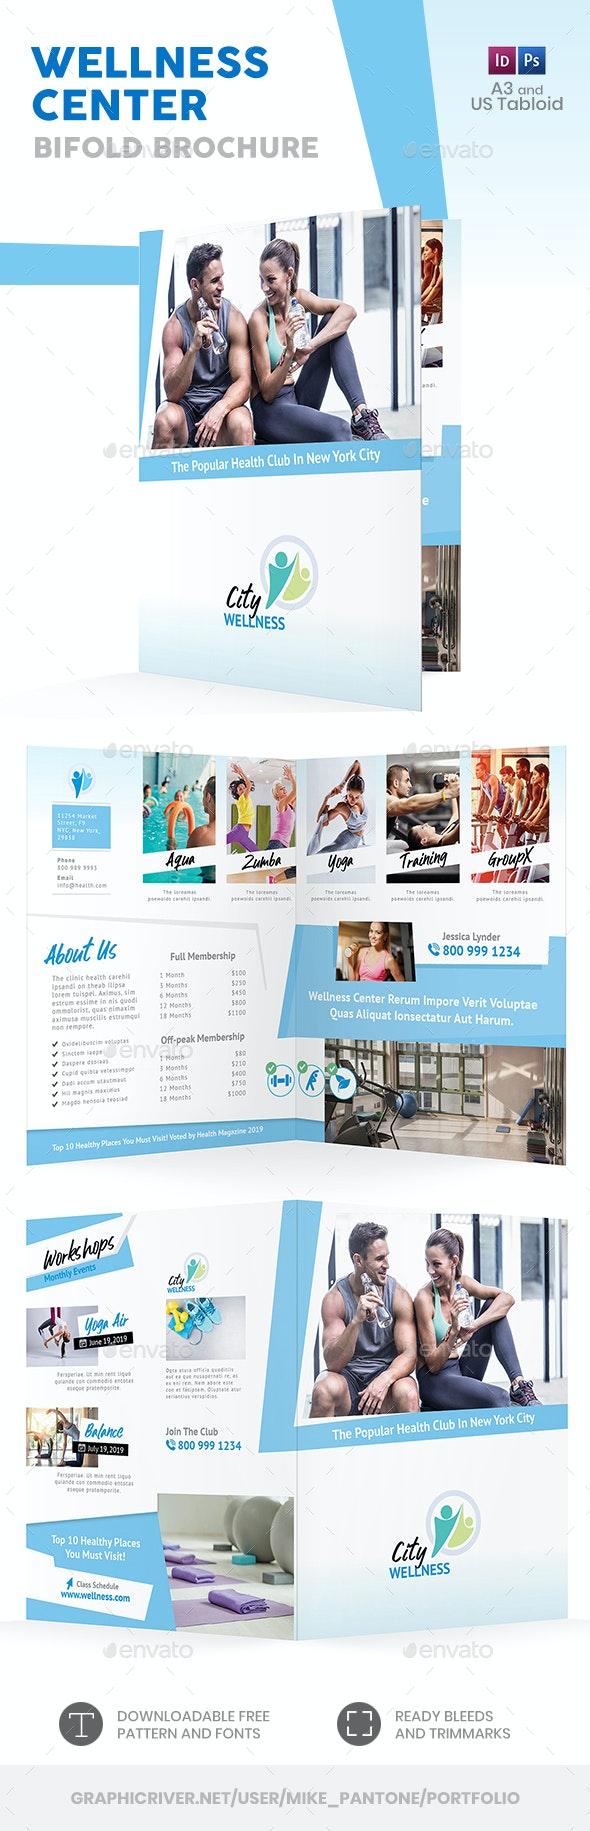 Wellness Center Bifold / Halffold Brochure 2 - Informational Brochures